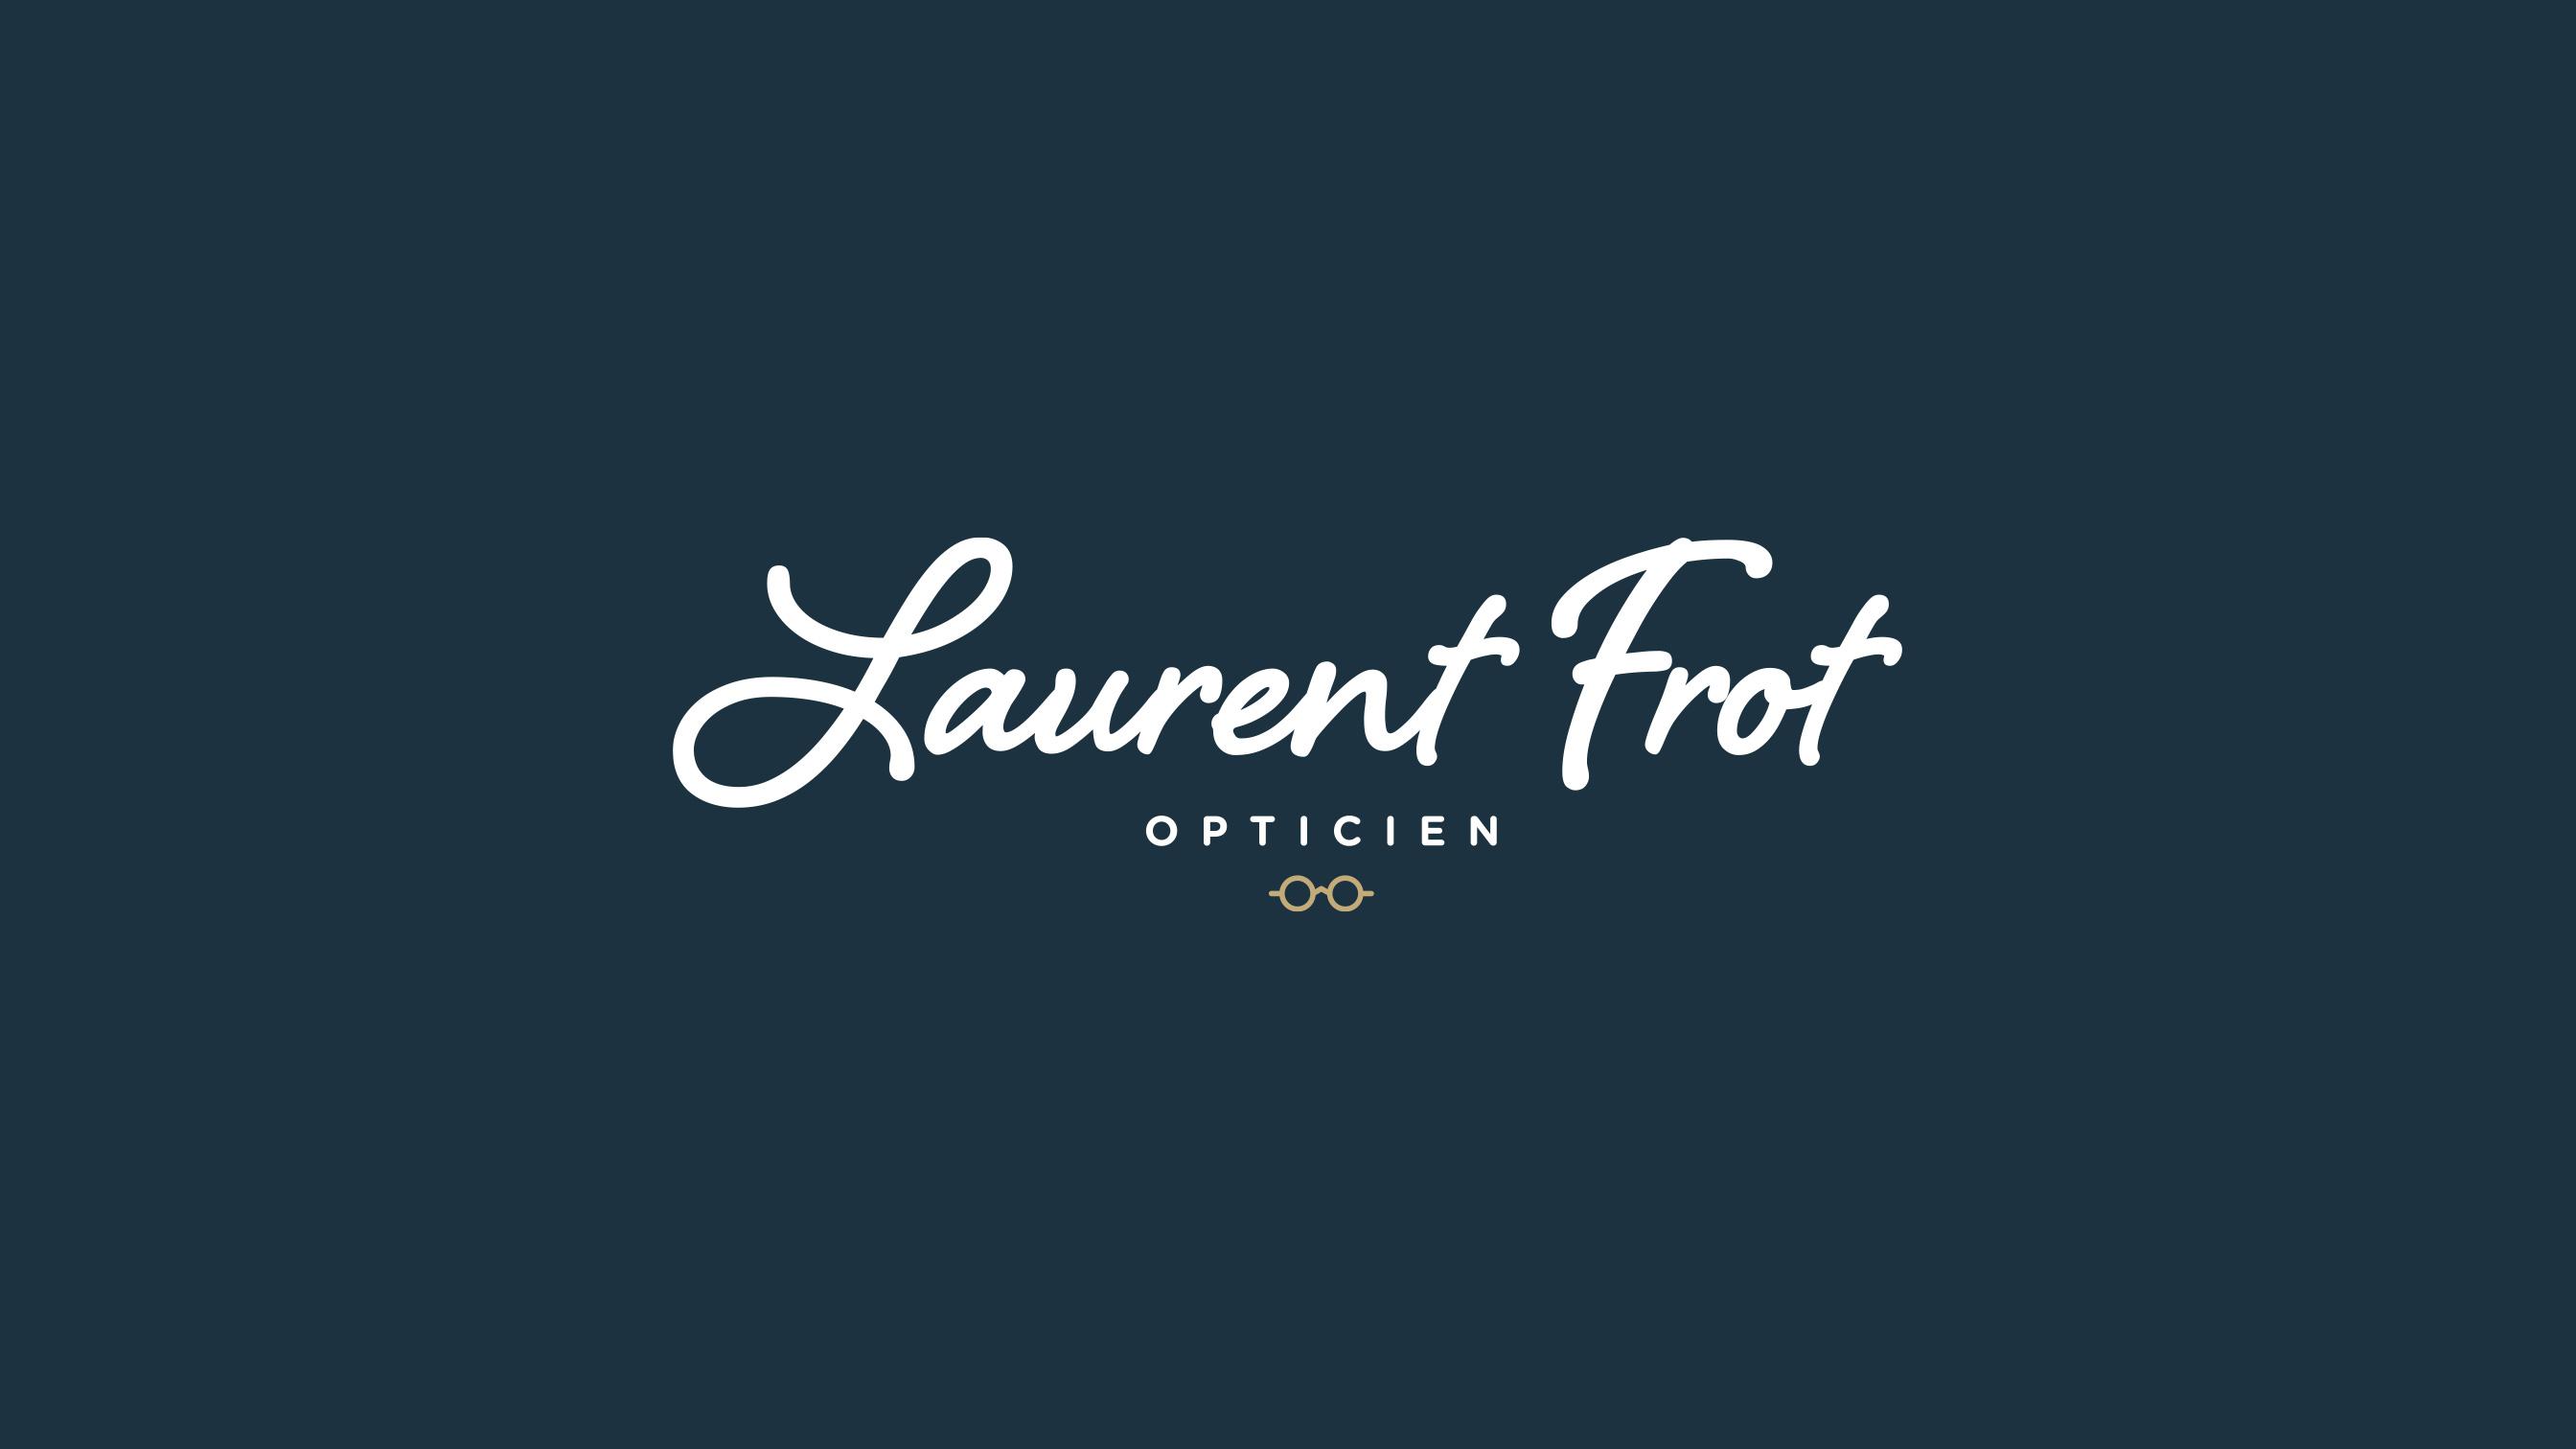 01-laurent-frot-opticien-pikteo-webdesign-graphic-design-freelance-paris-bruxelles-londres